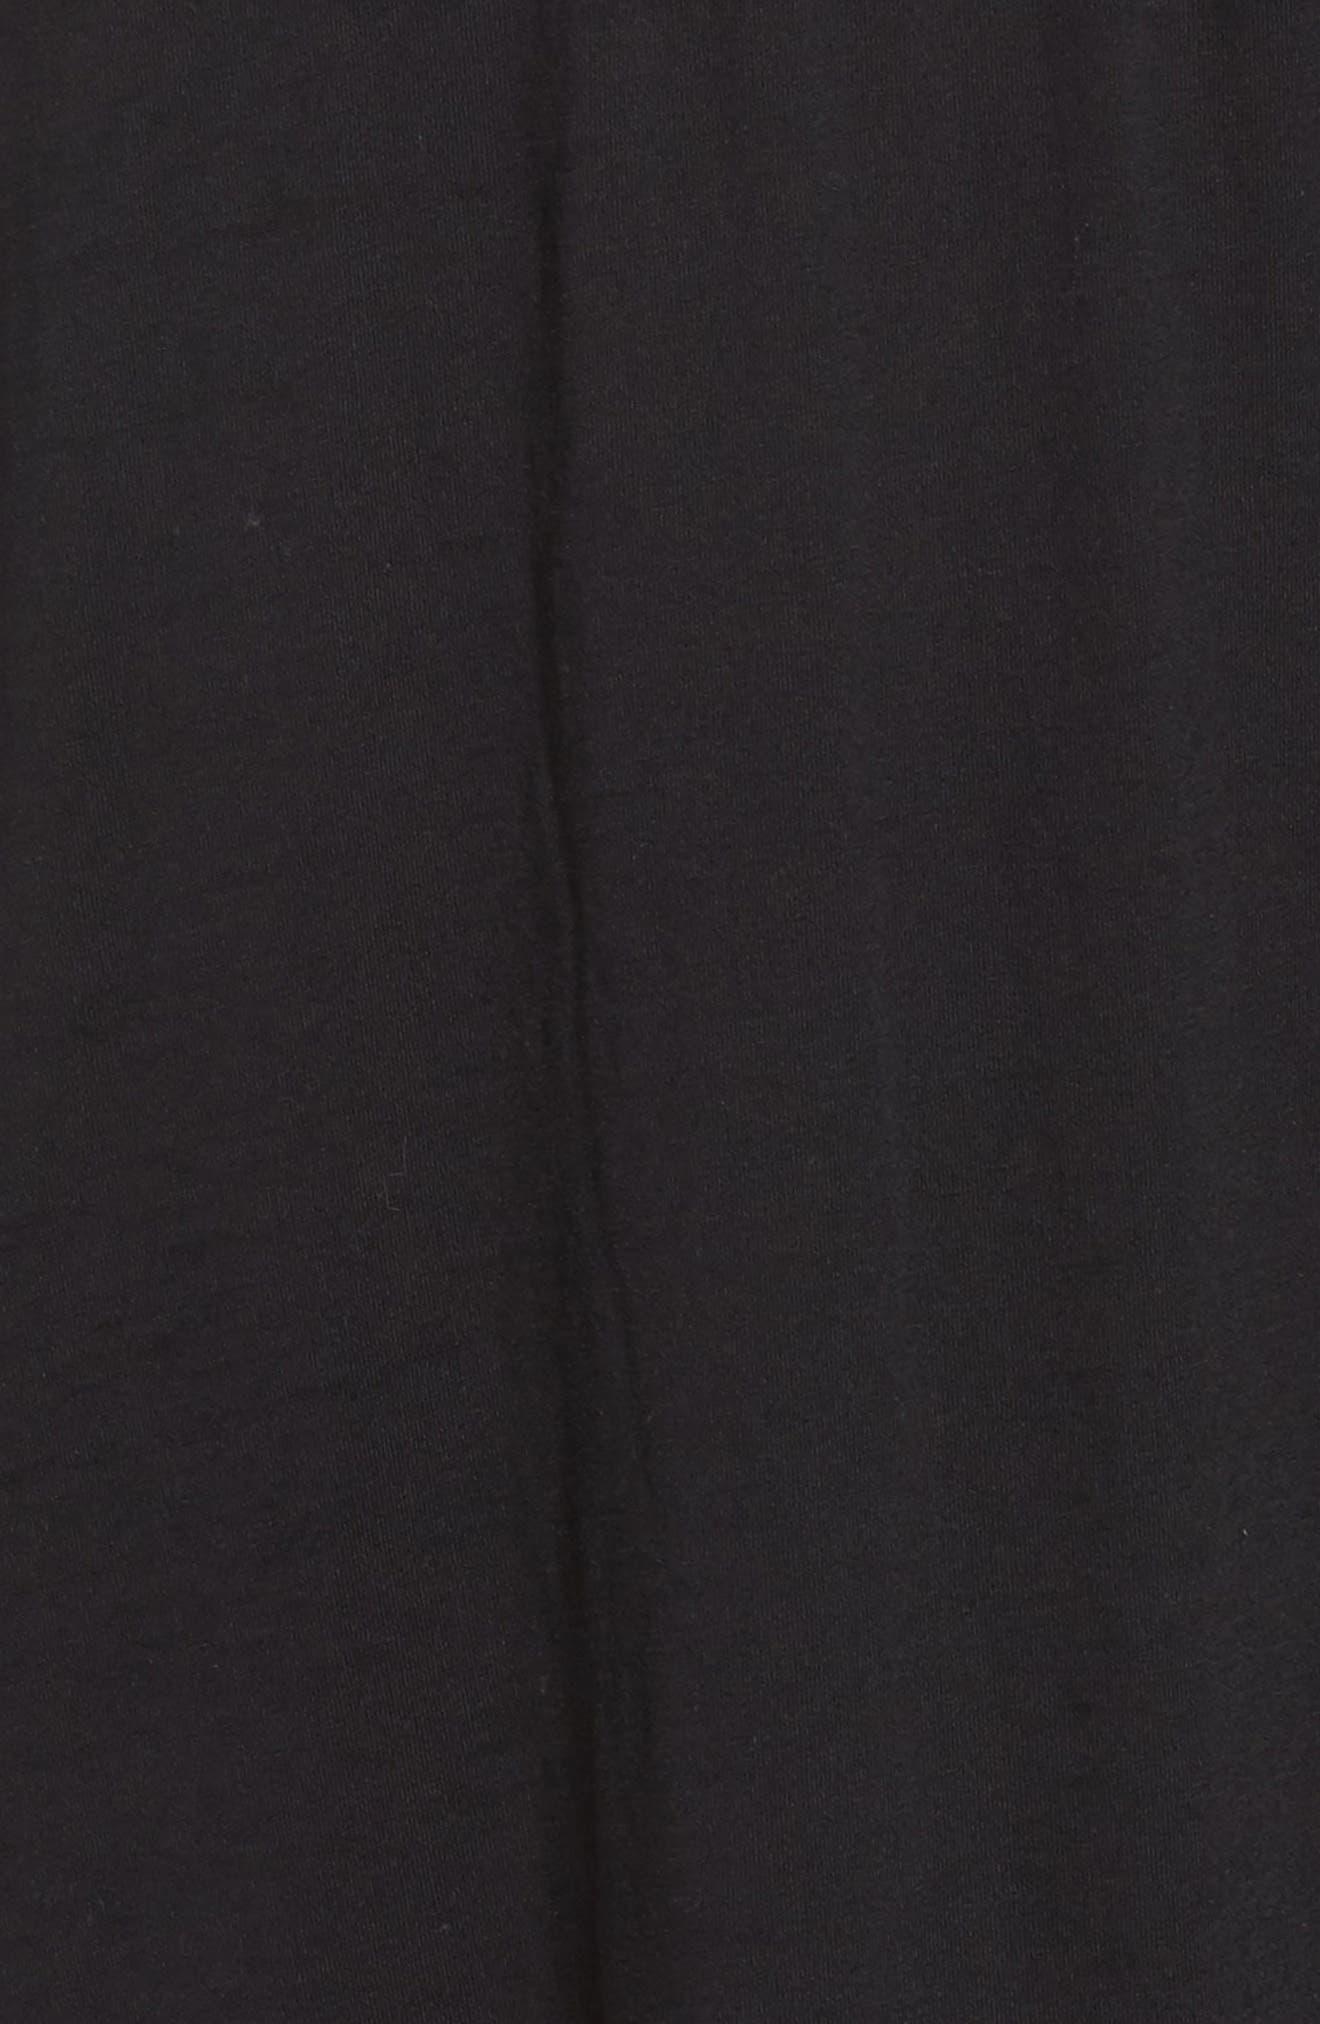 Maxi Cover-Up Dress,                             Alternate thumbnail 21, color,